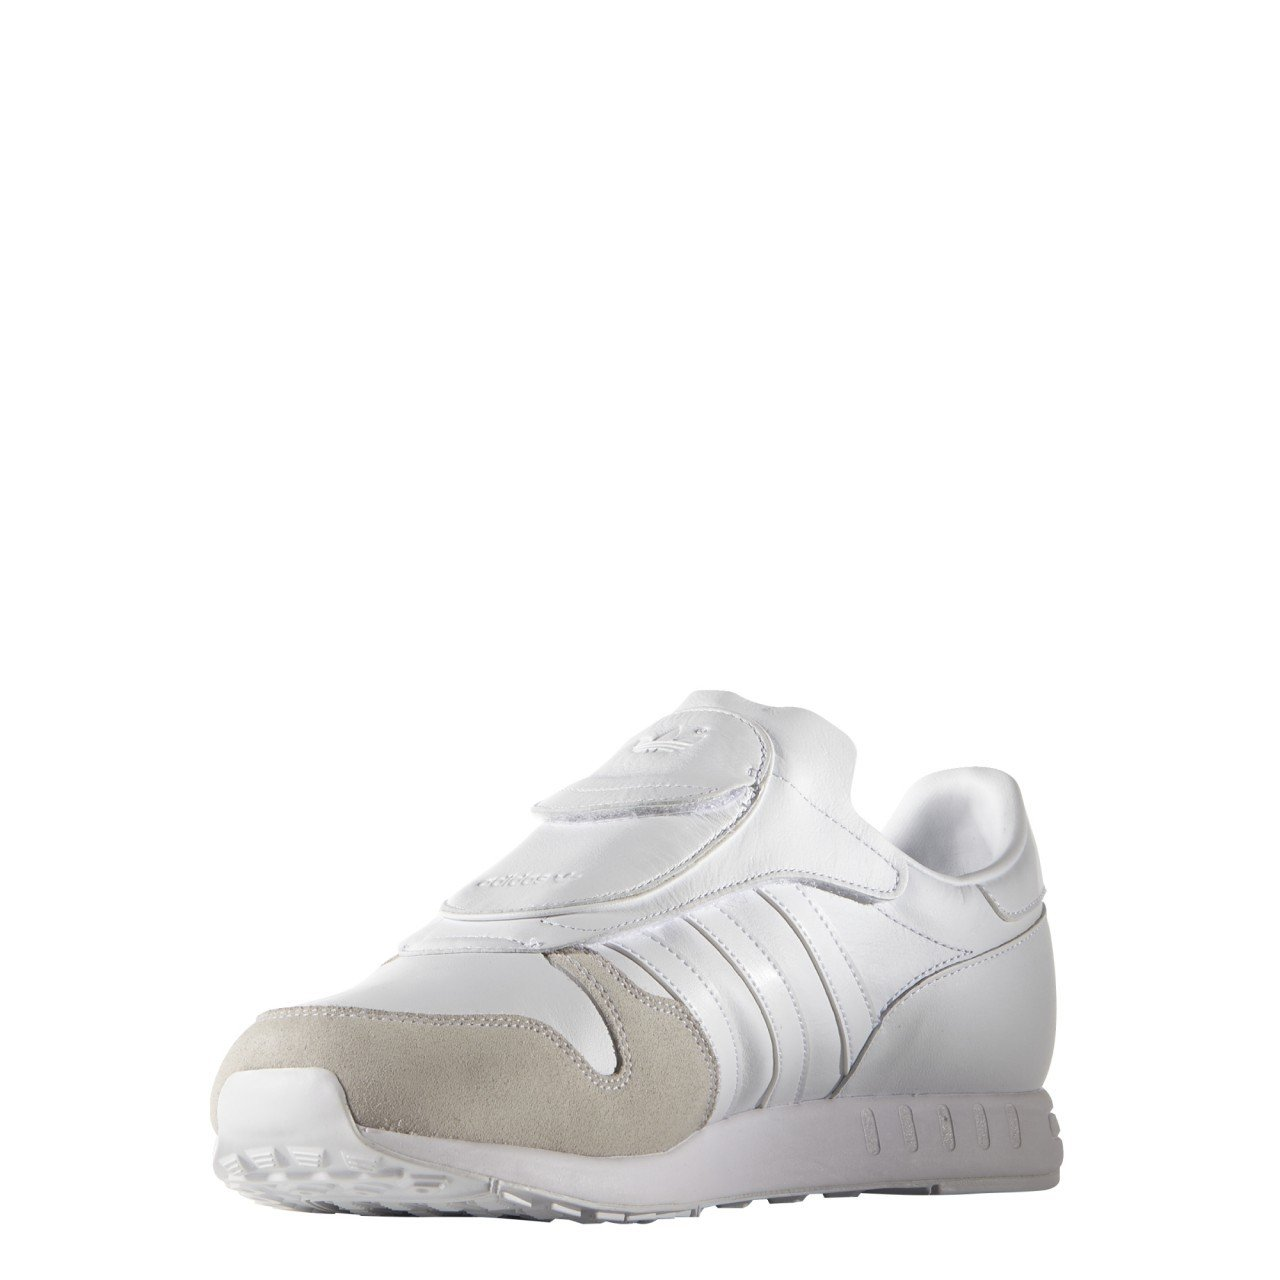 adidas AOH 006 Pedometer MainApps White Size: 8: Amazon.co